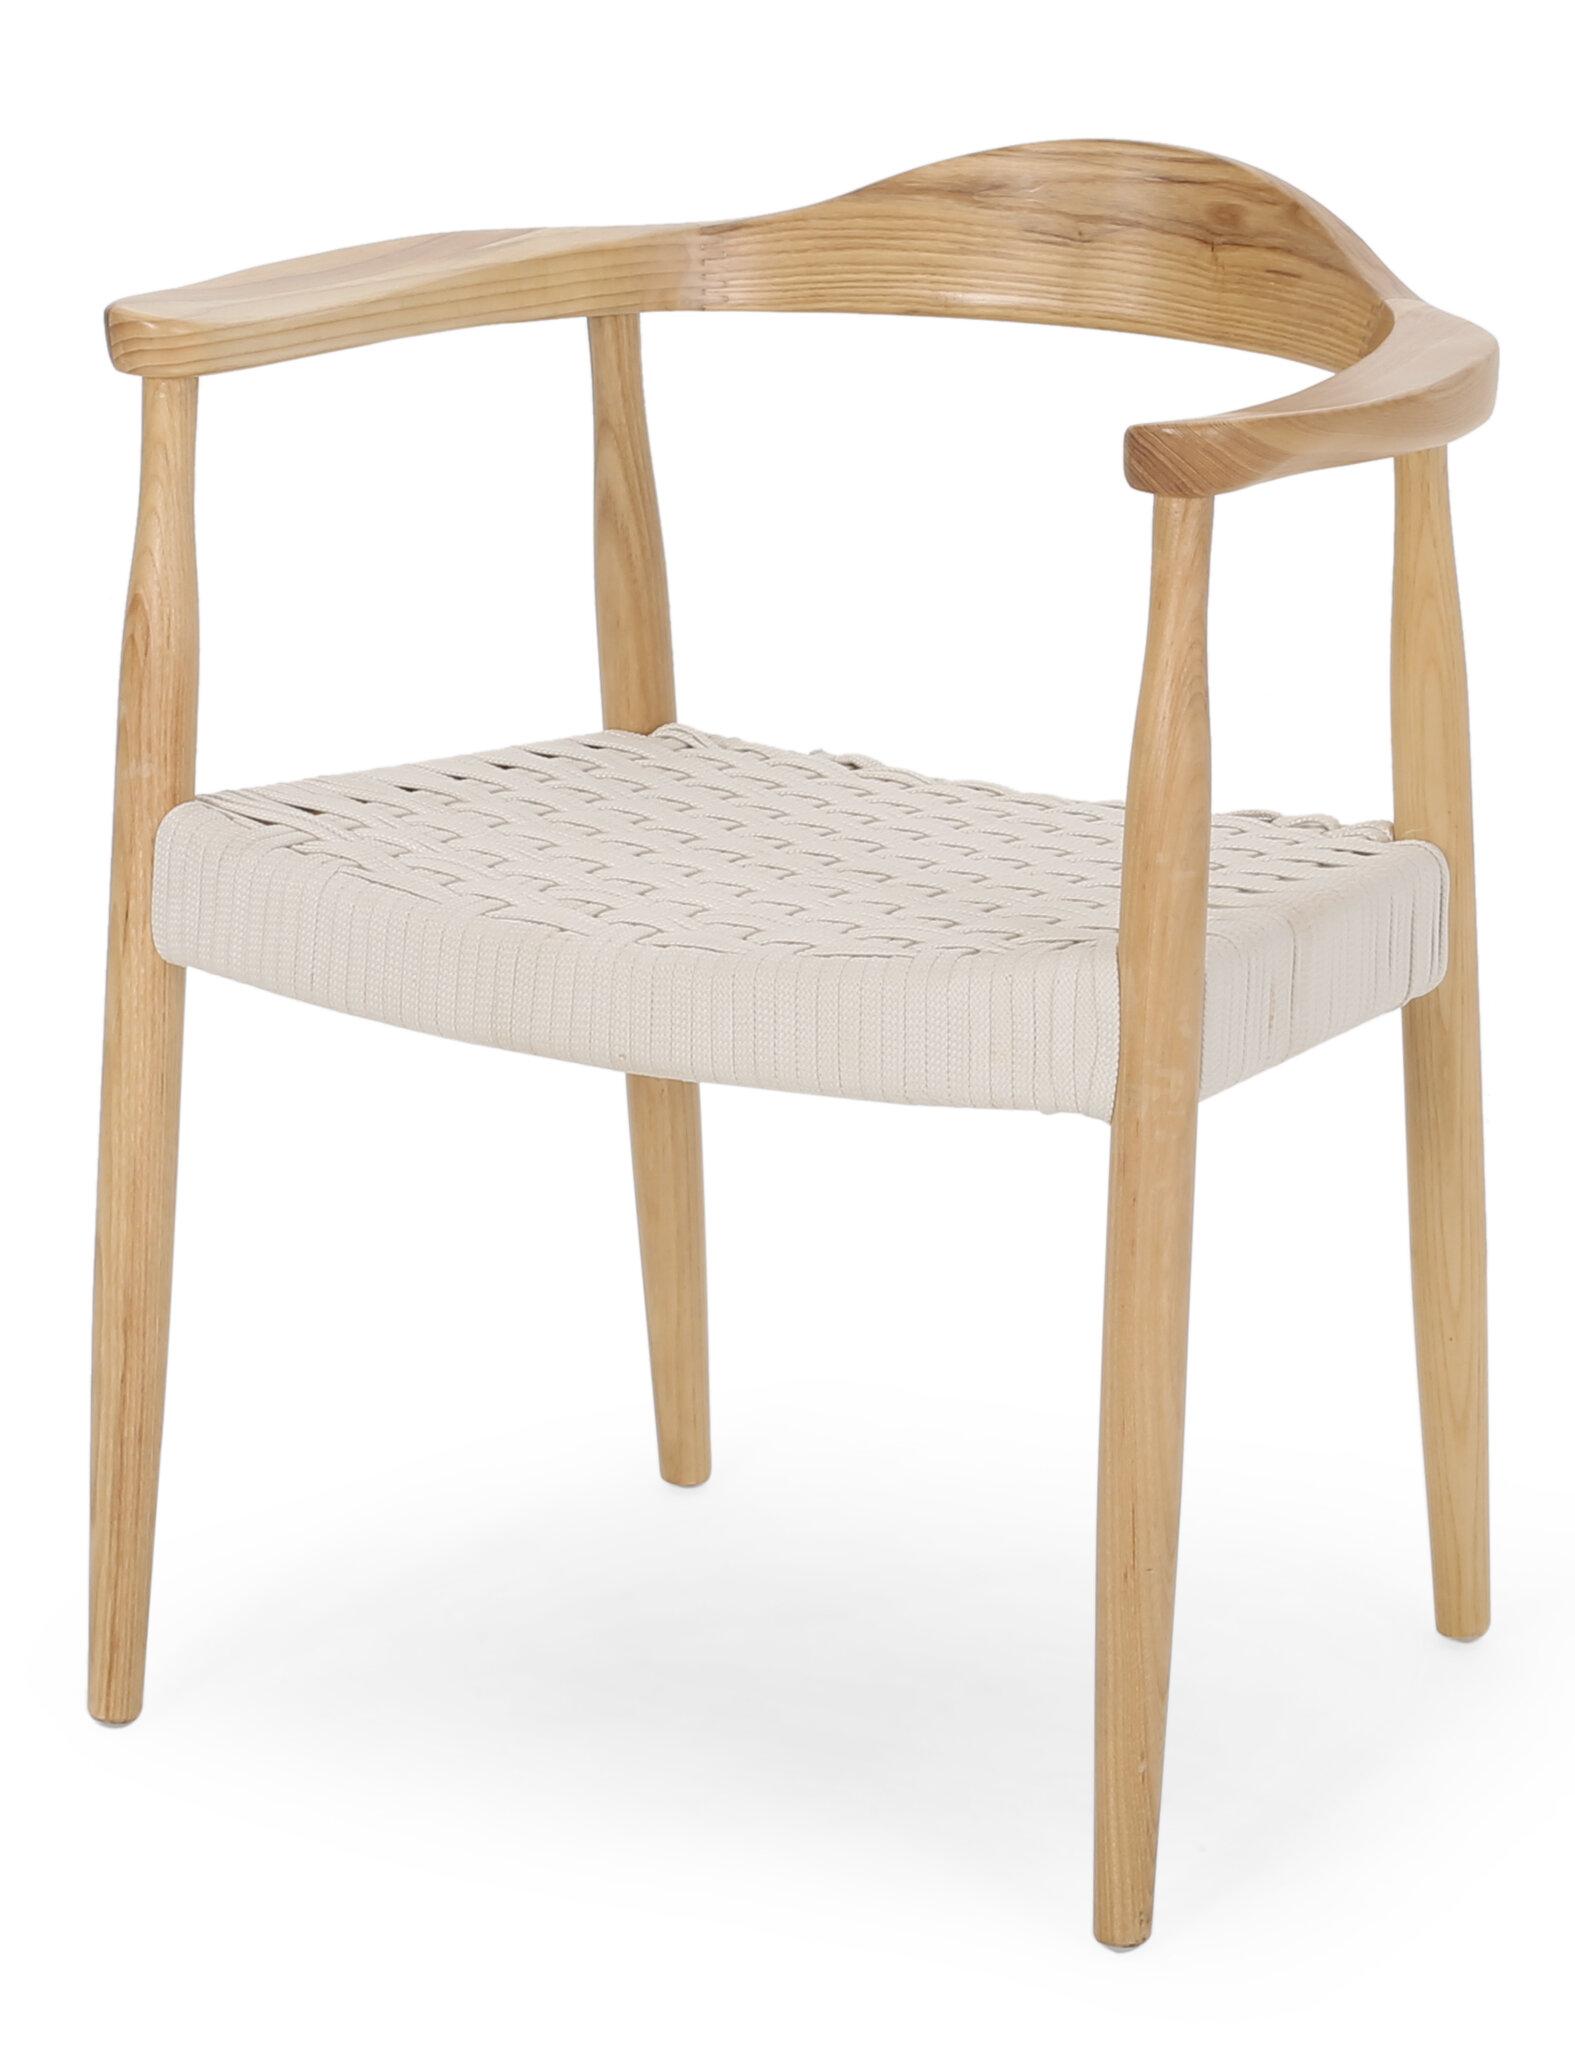 New Mid Century Chair Wood